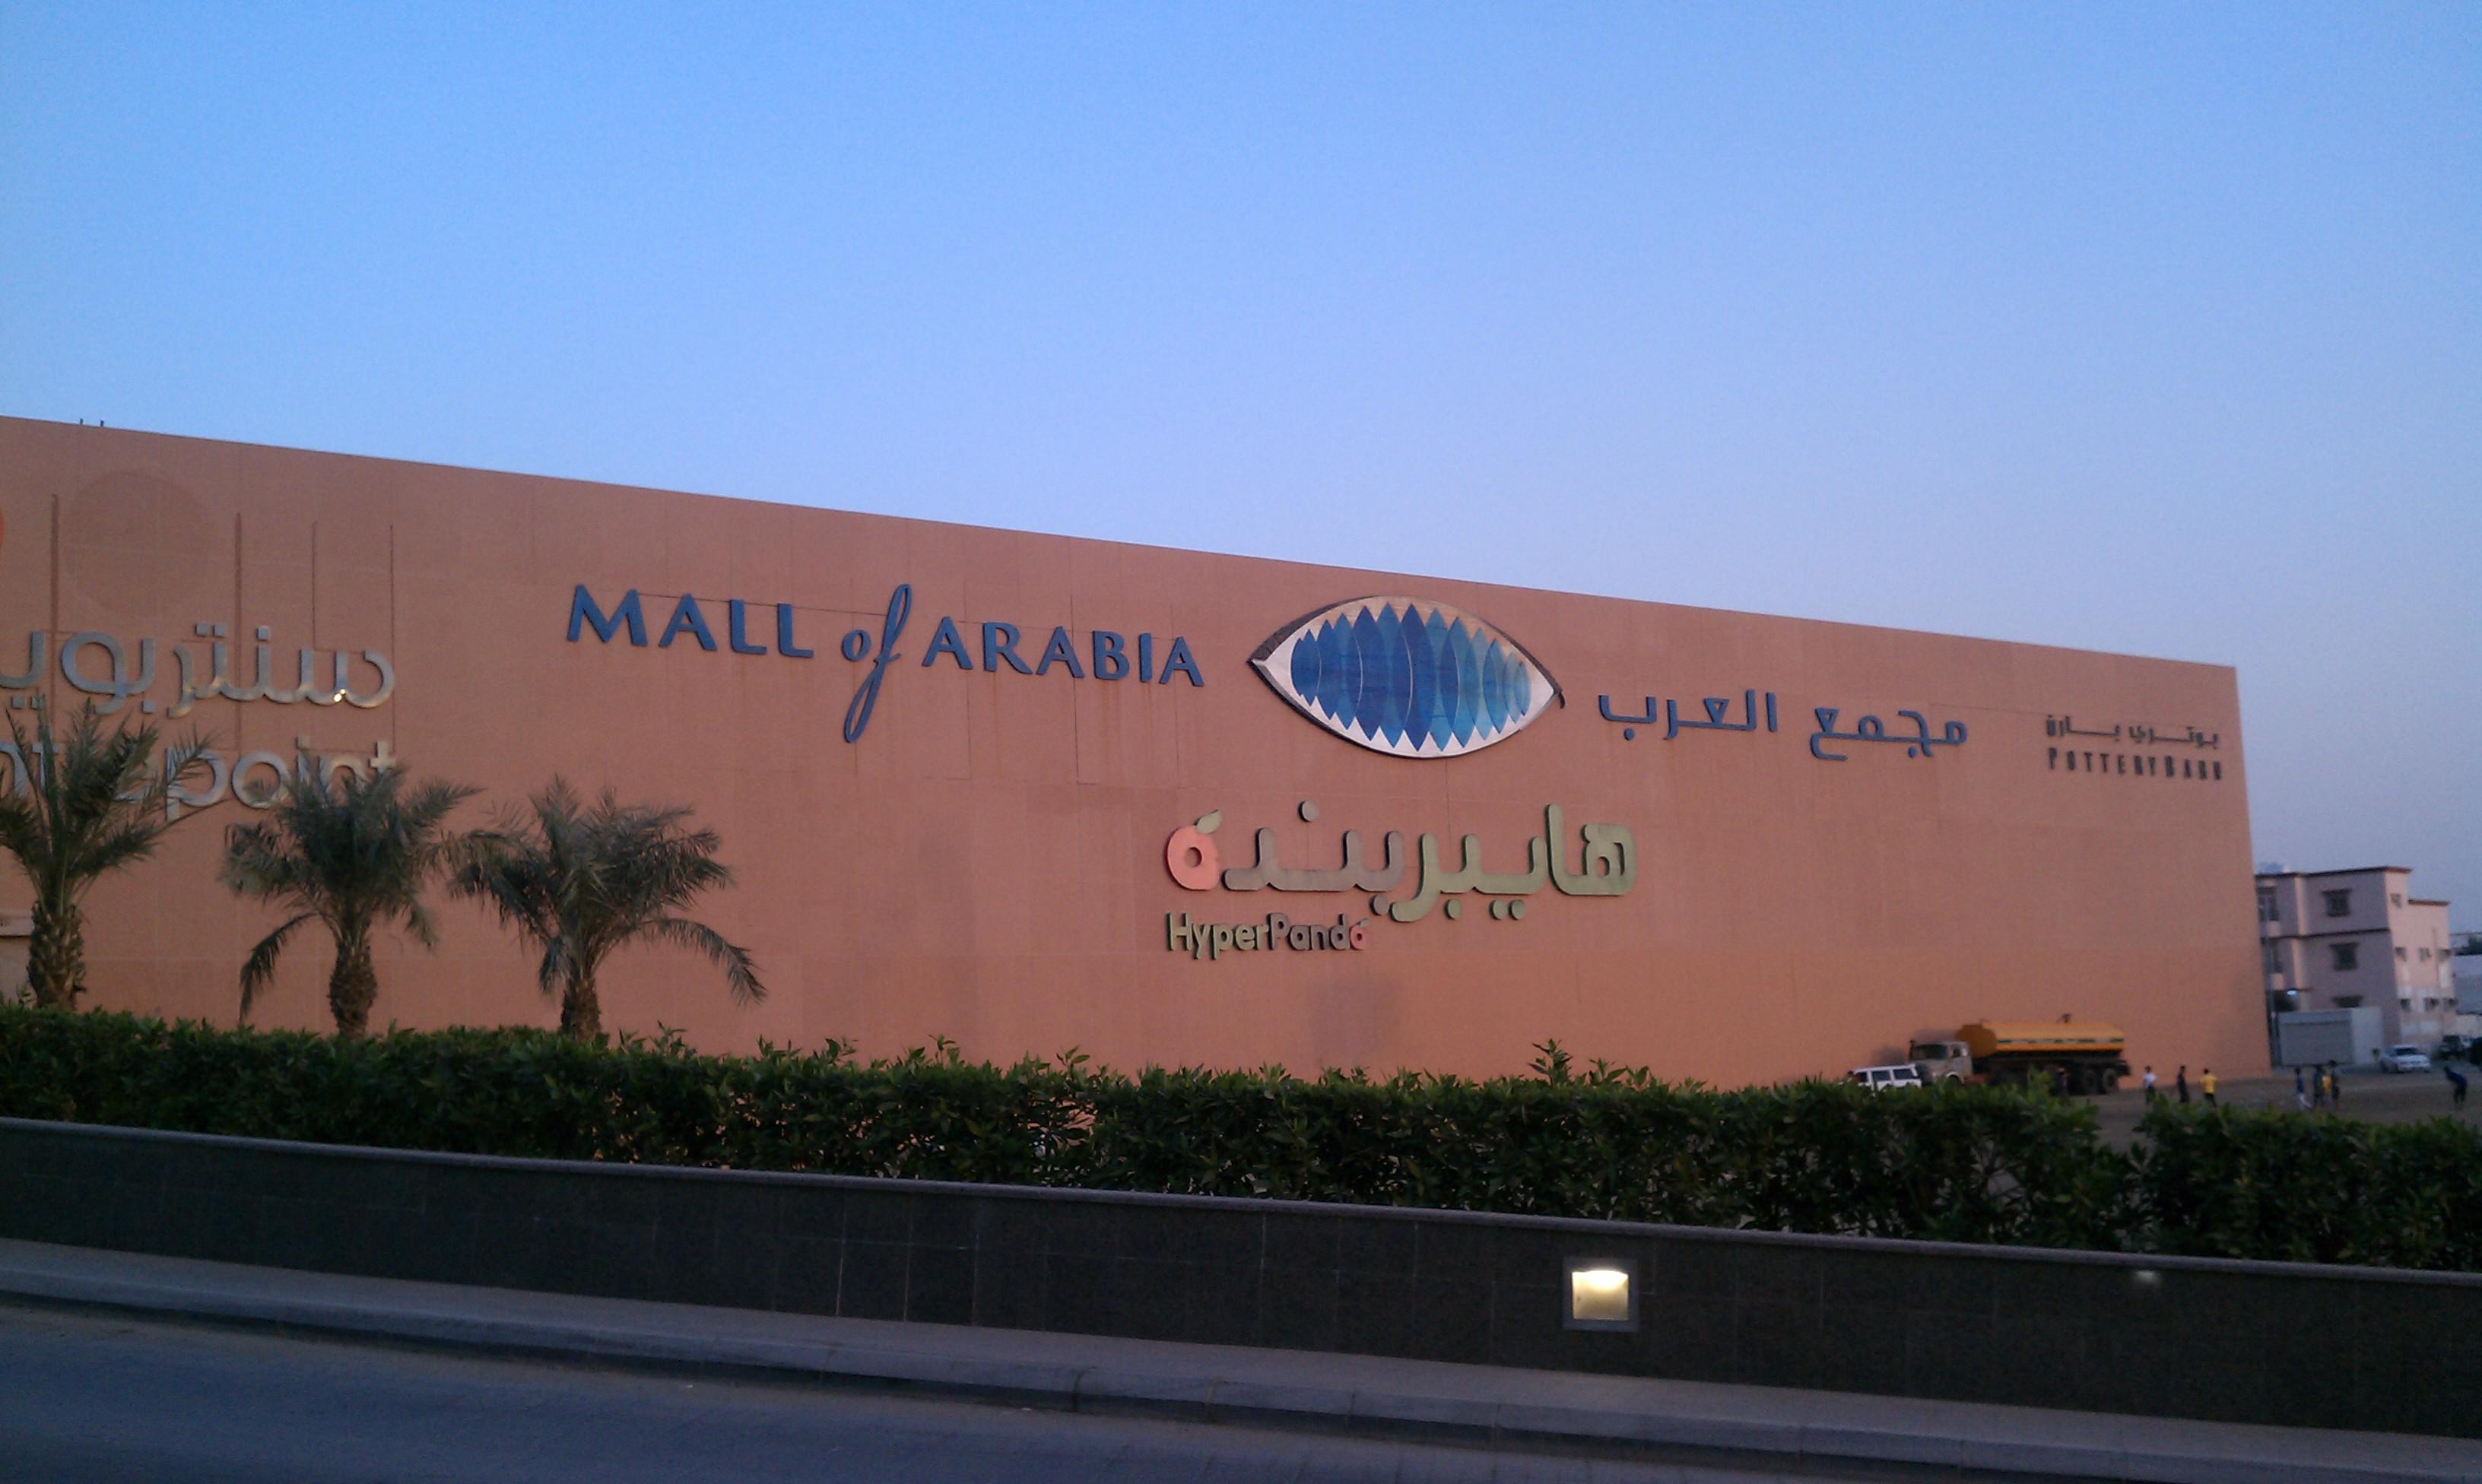 jeddah_mall_of_arabia_signage